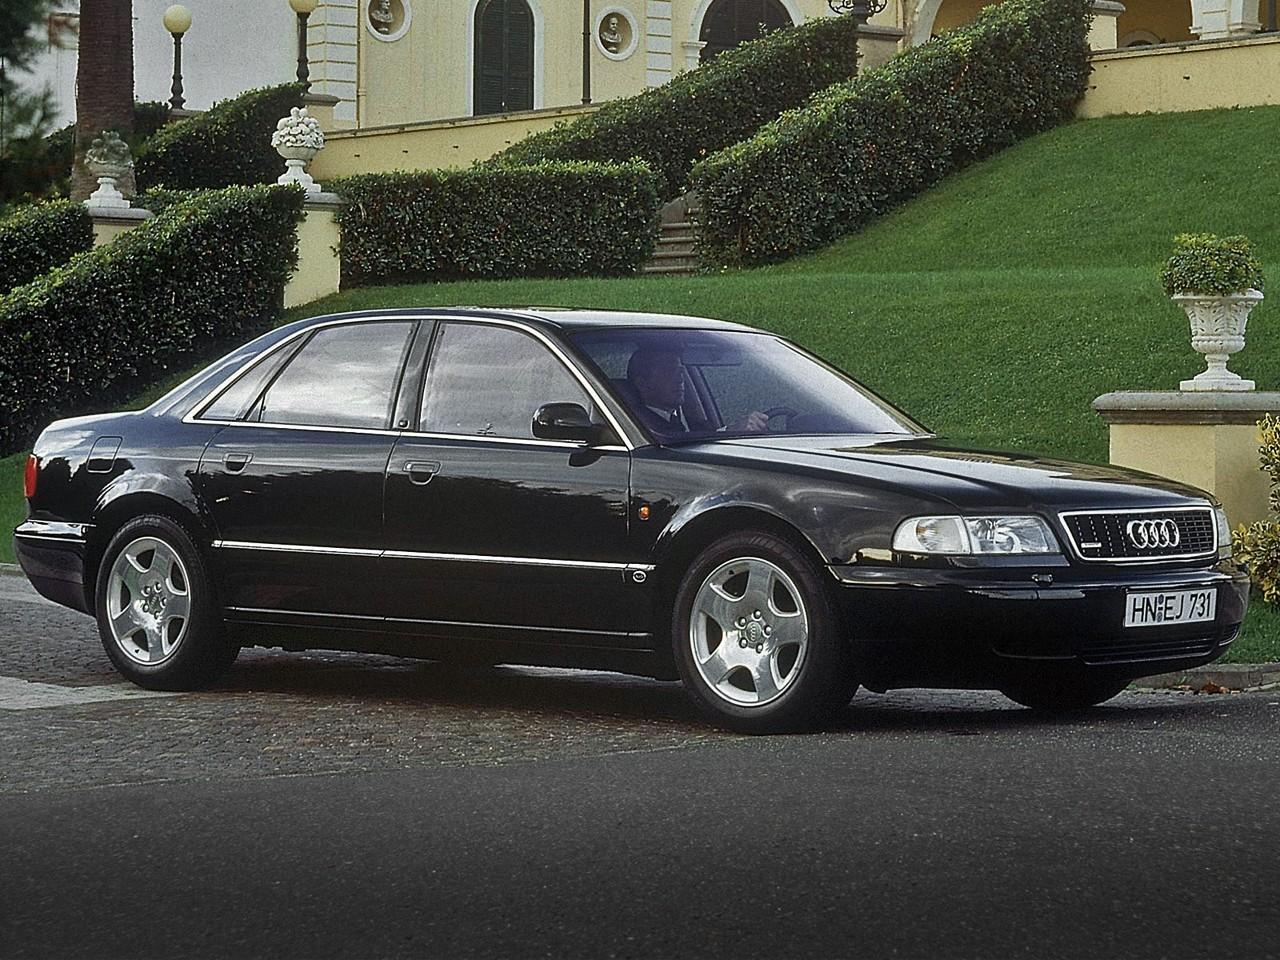 Audi A8 D2 Specs 1994 1995 1996 1997 1998 1999